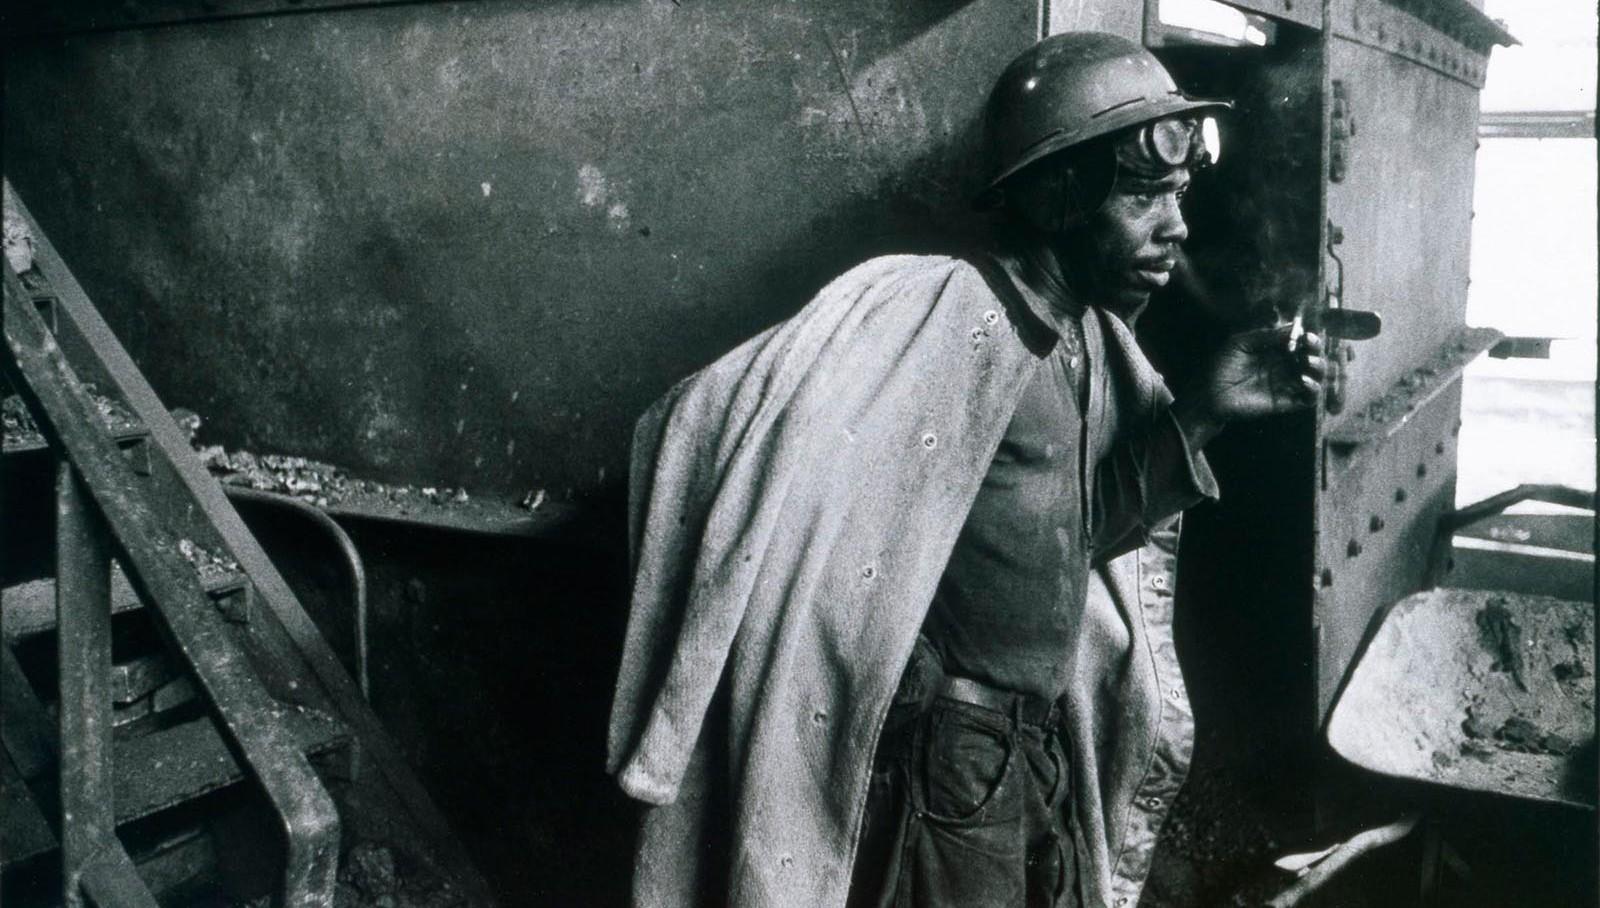 Smoking steelworker